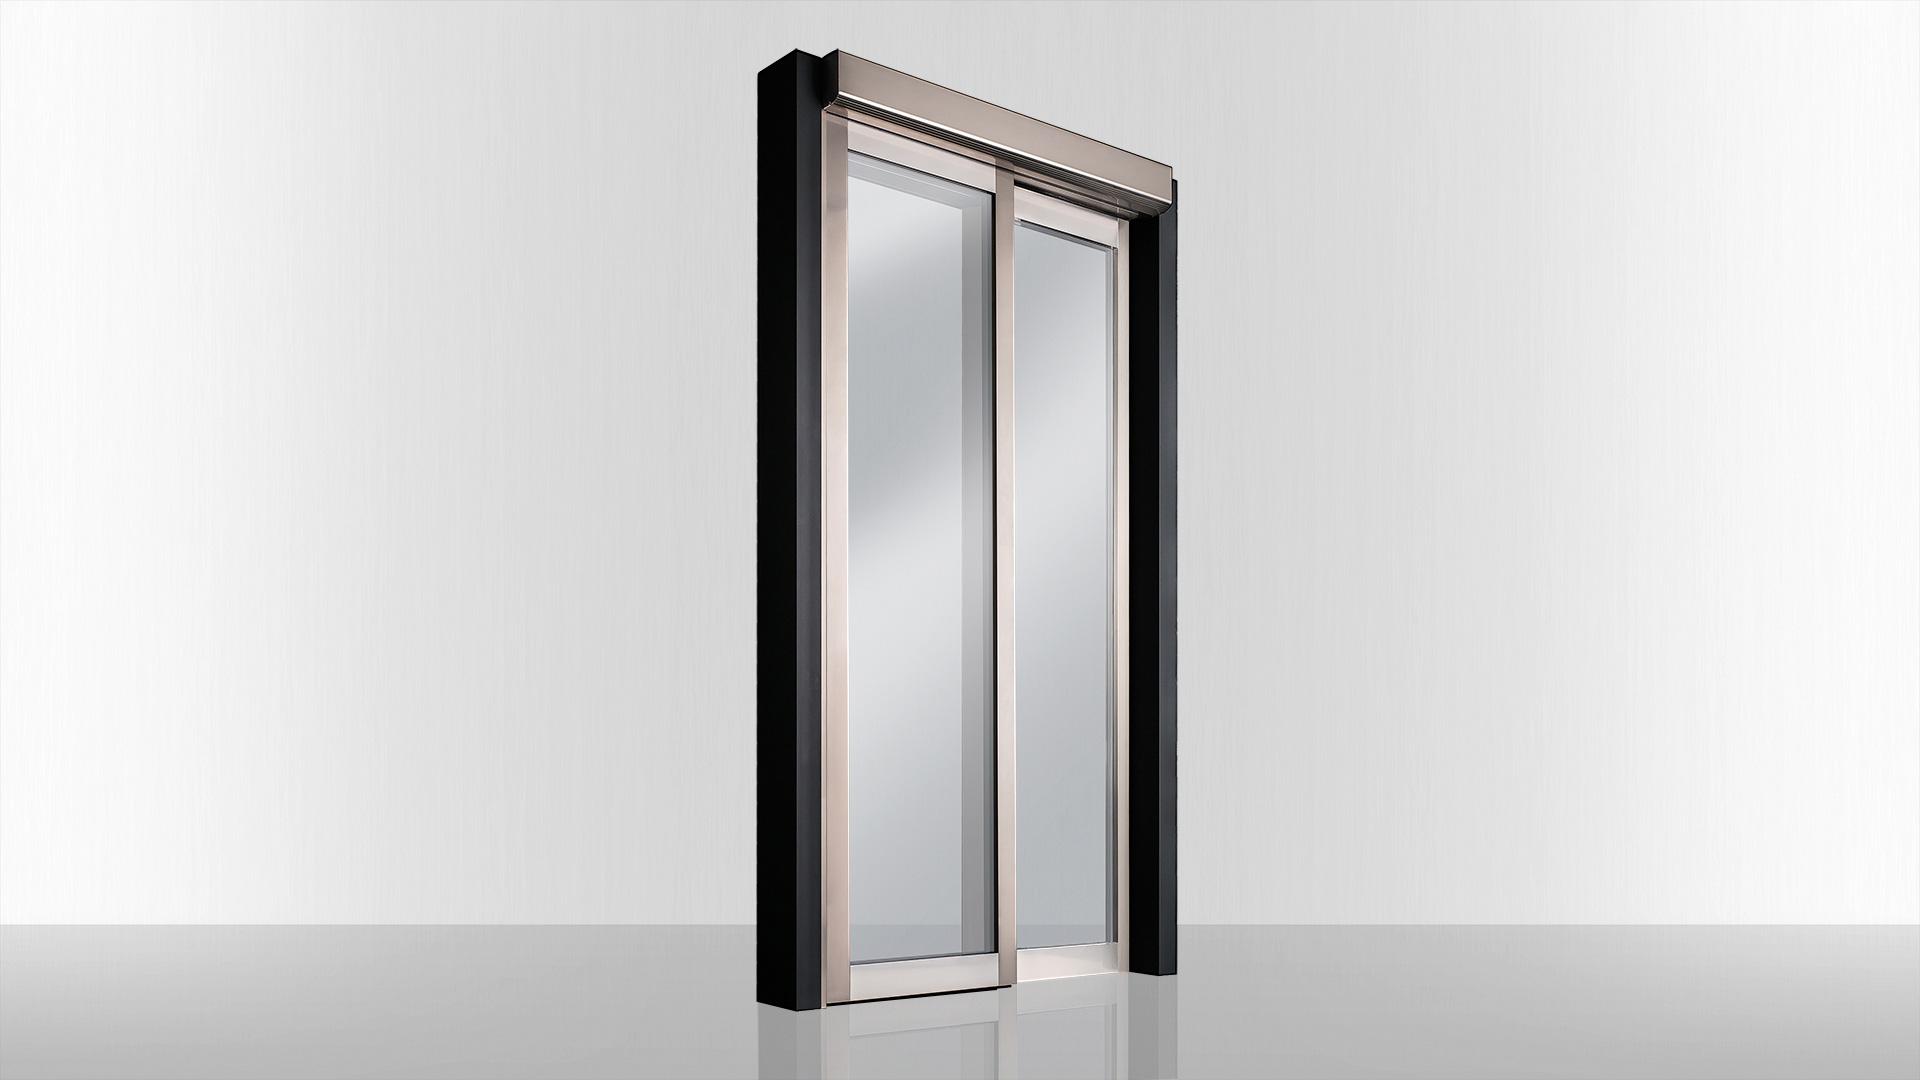 bloxa-70-scorrevole-sliding_porta-tagliafuoco